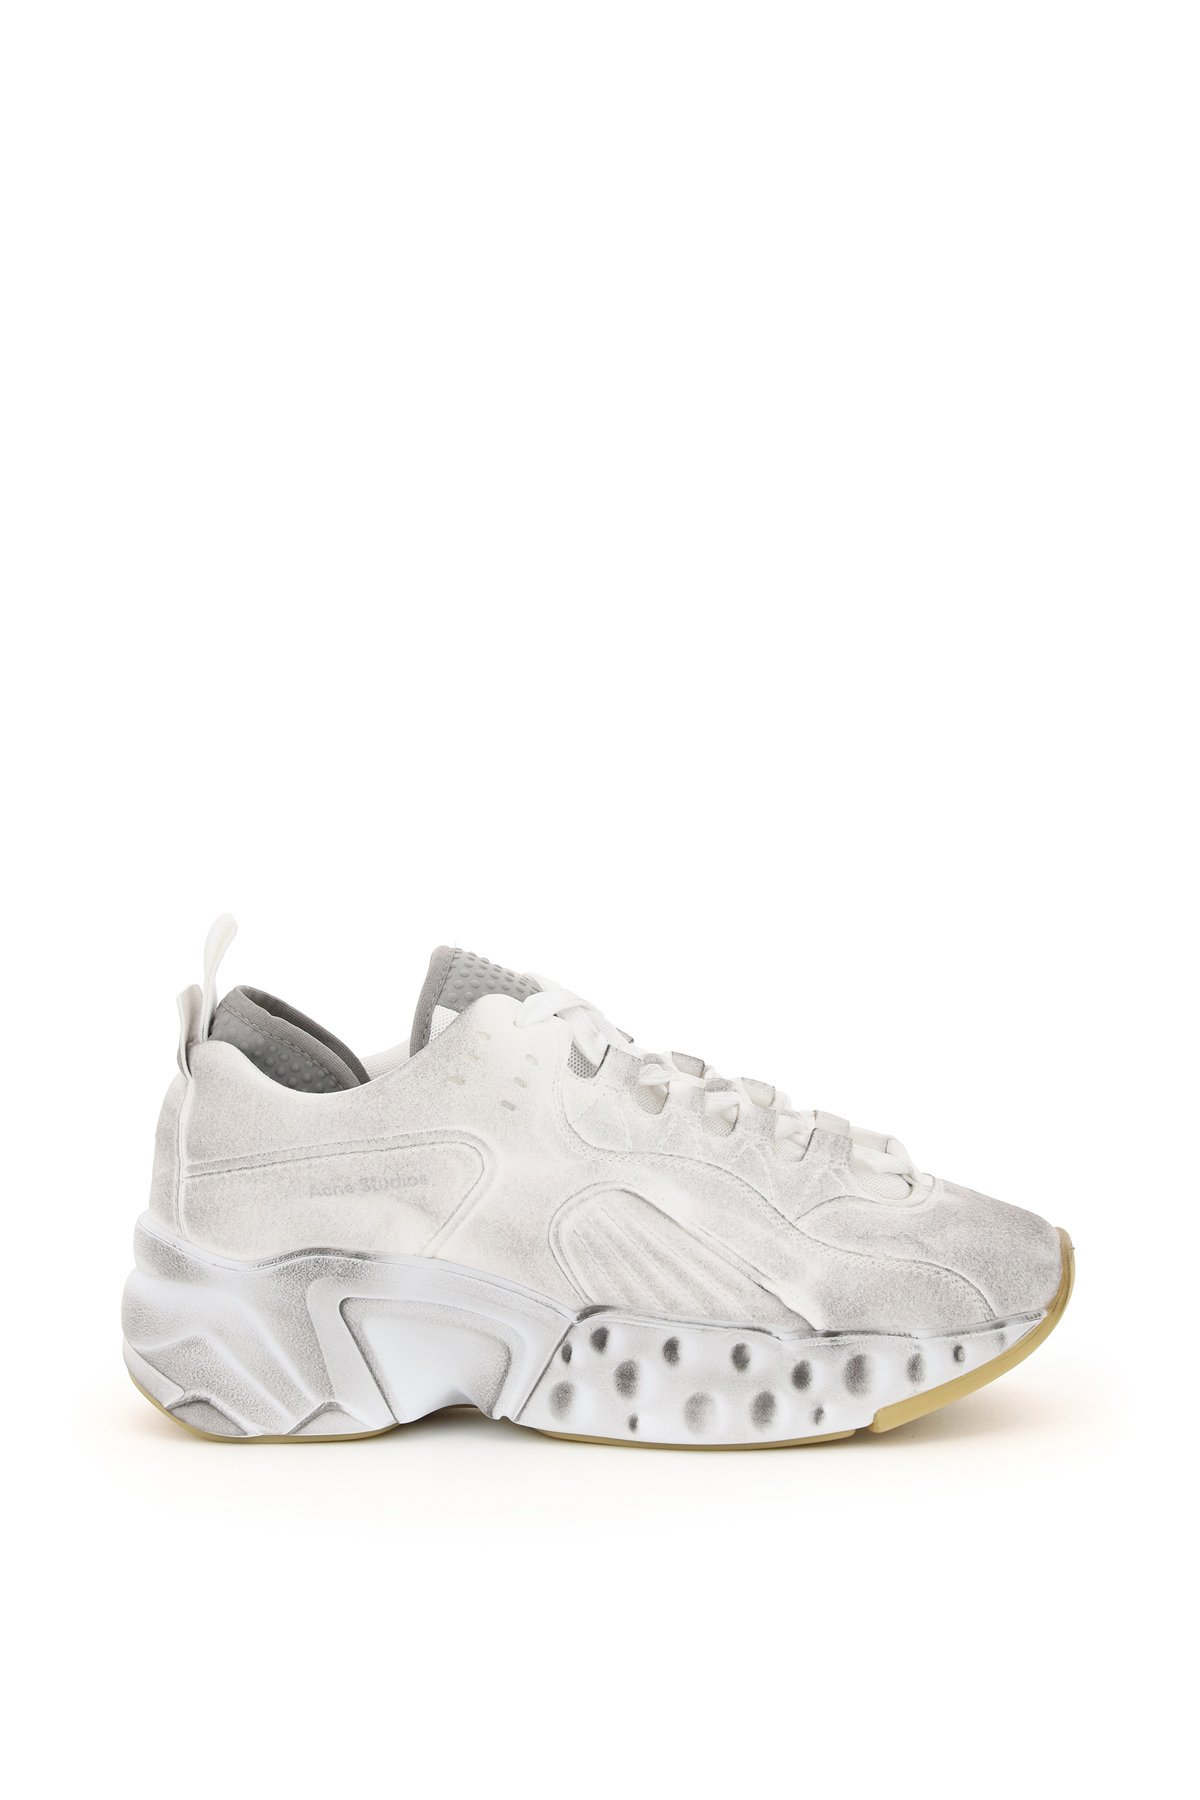 Acne studios sneakers manhattan tumbled